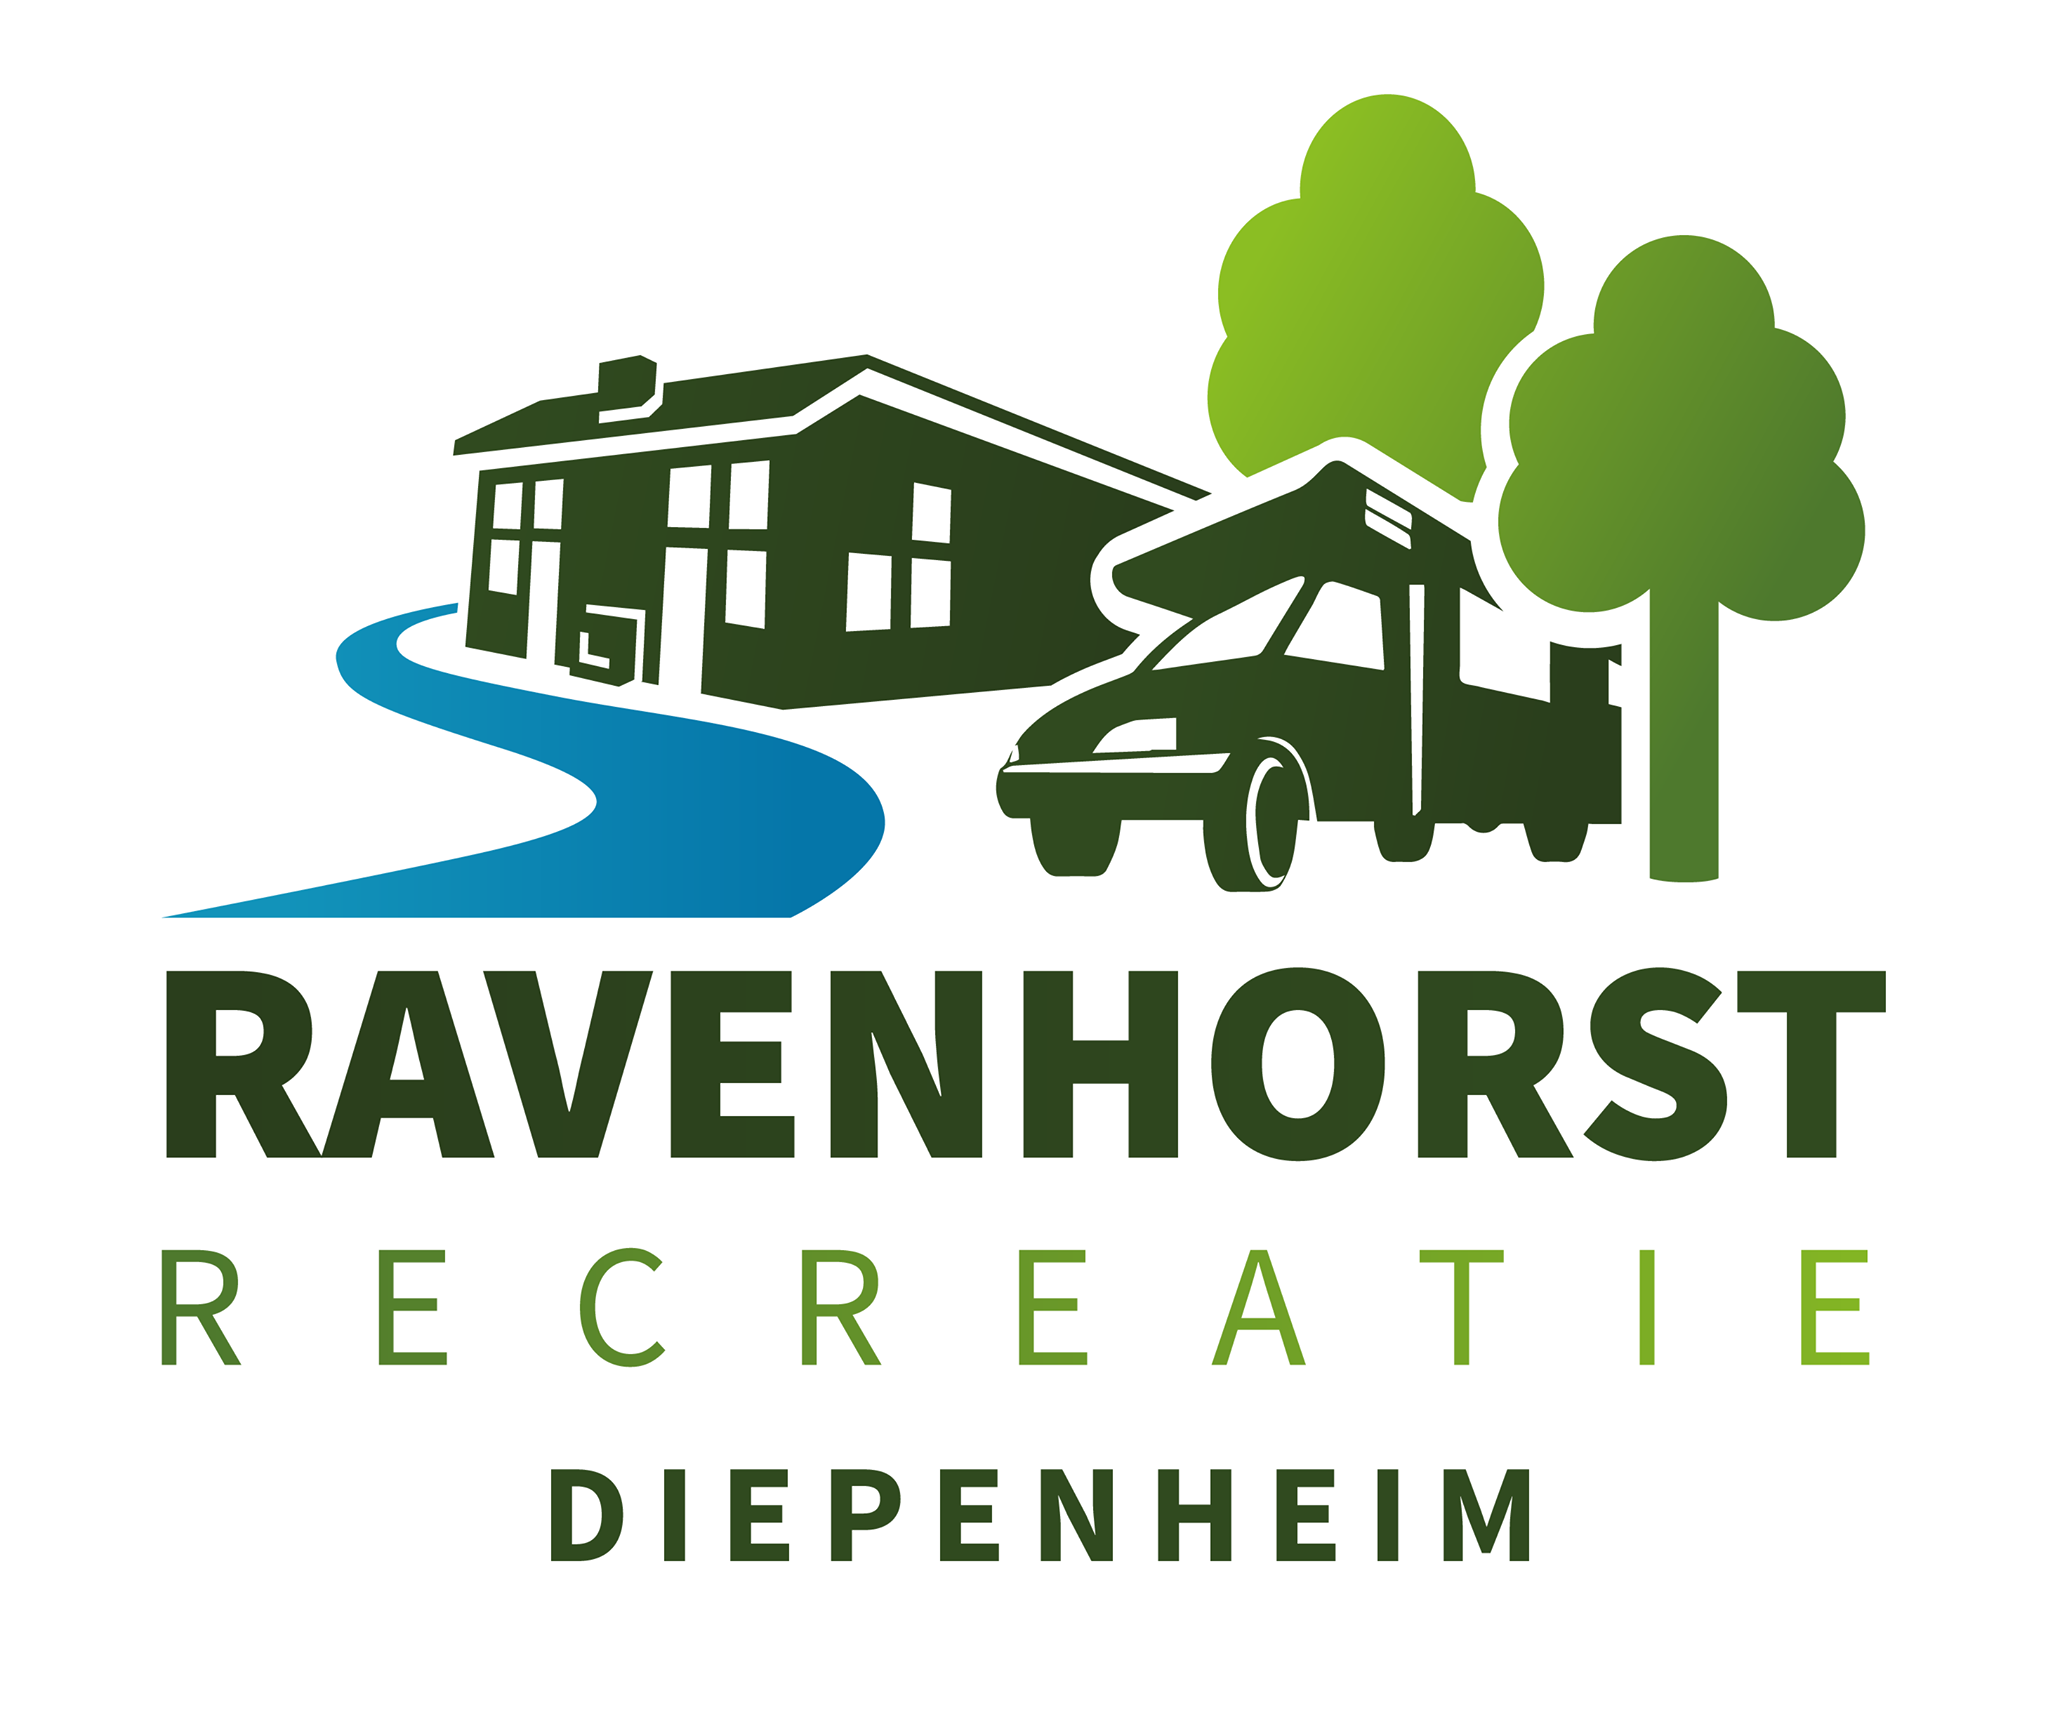 Camperpark Diepenheim  Ravenhorst Recreatie